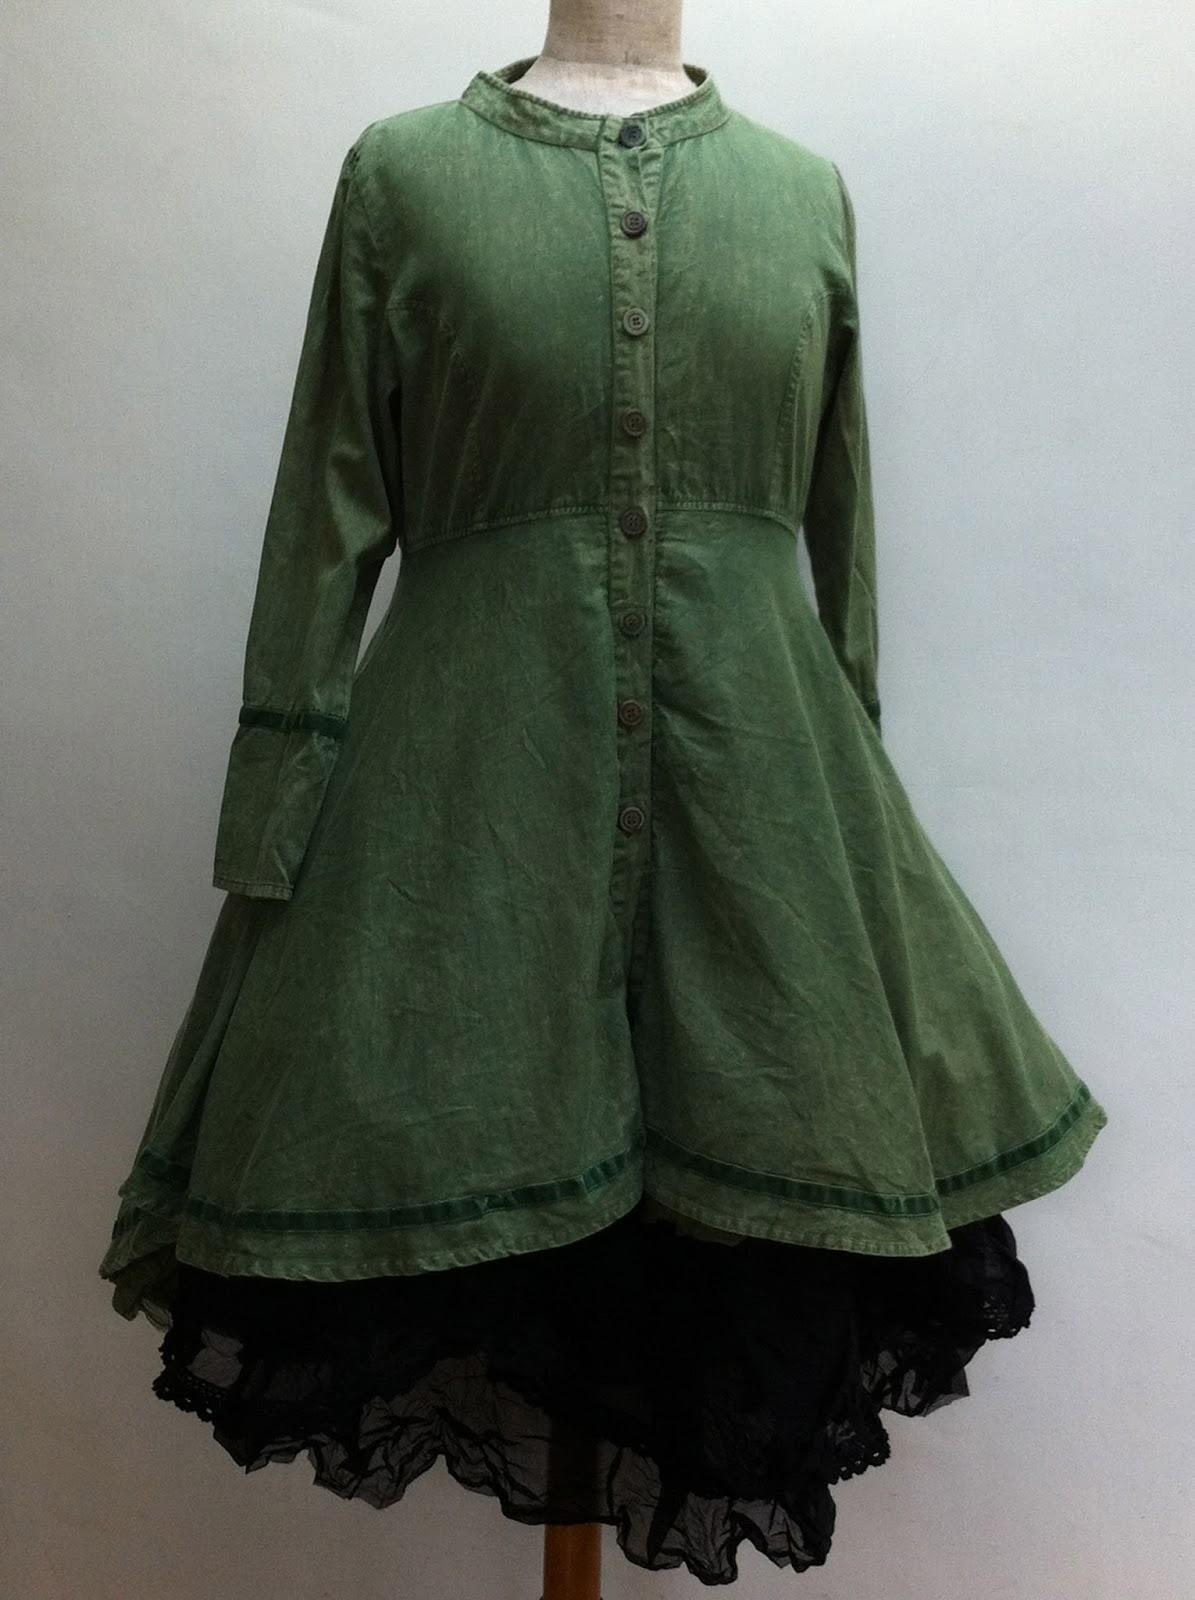 SESAME-CLOTHING...: EWA I WALLA AW13...NUMBER 26...66173 ...